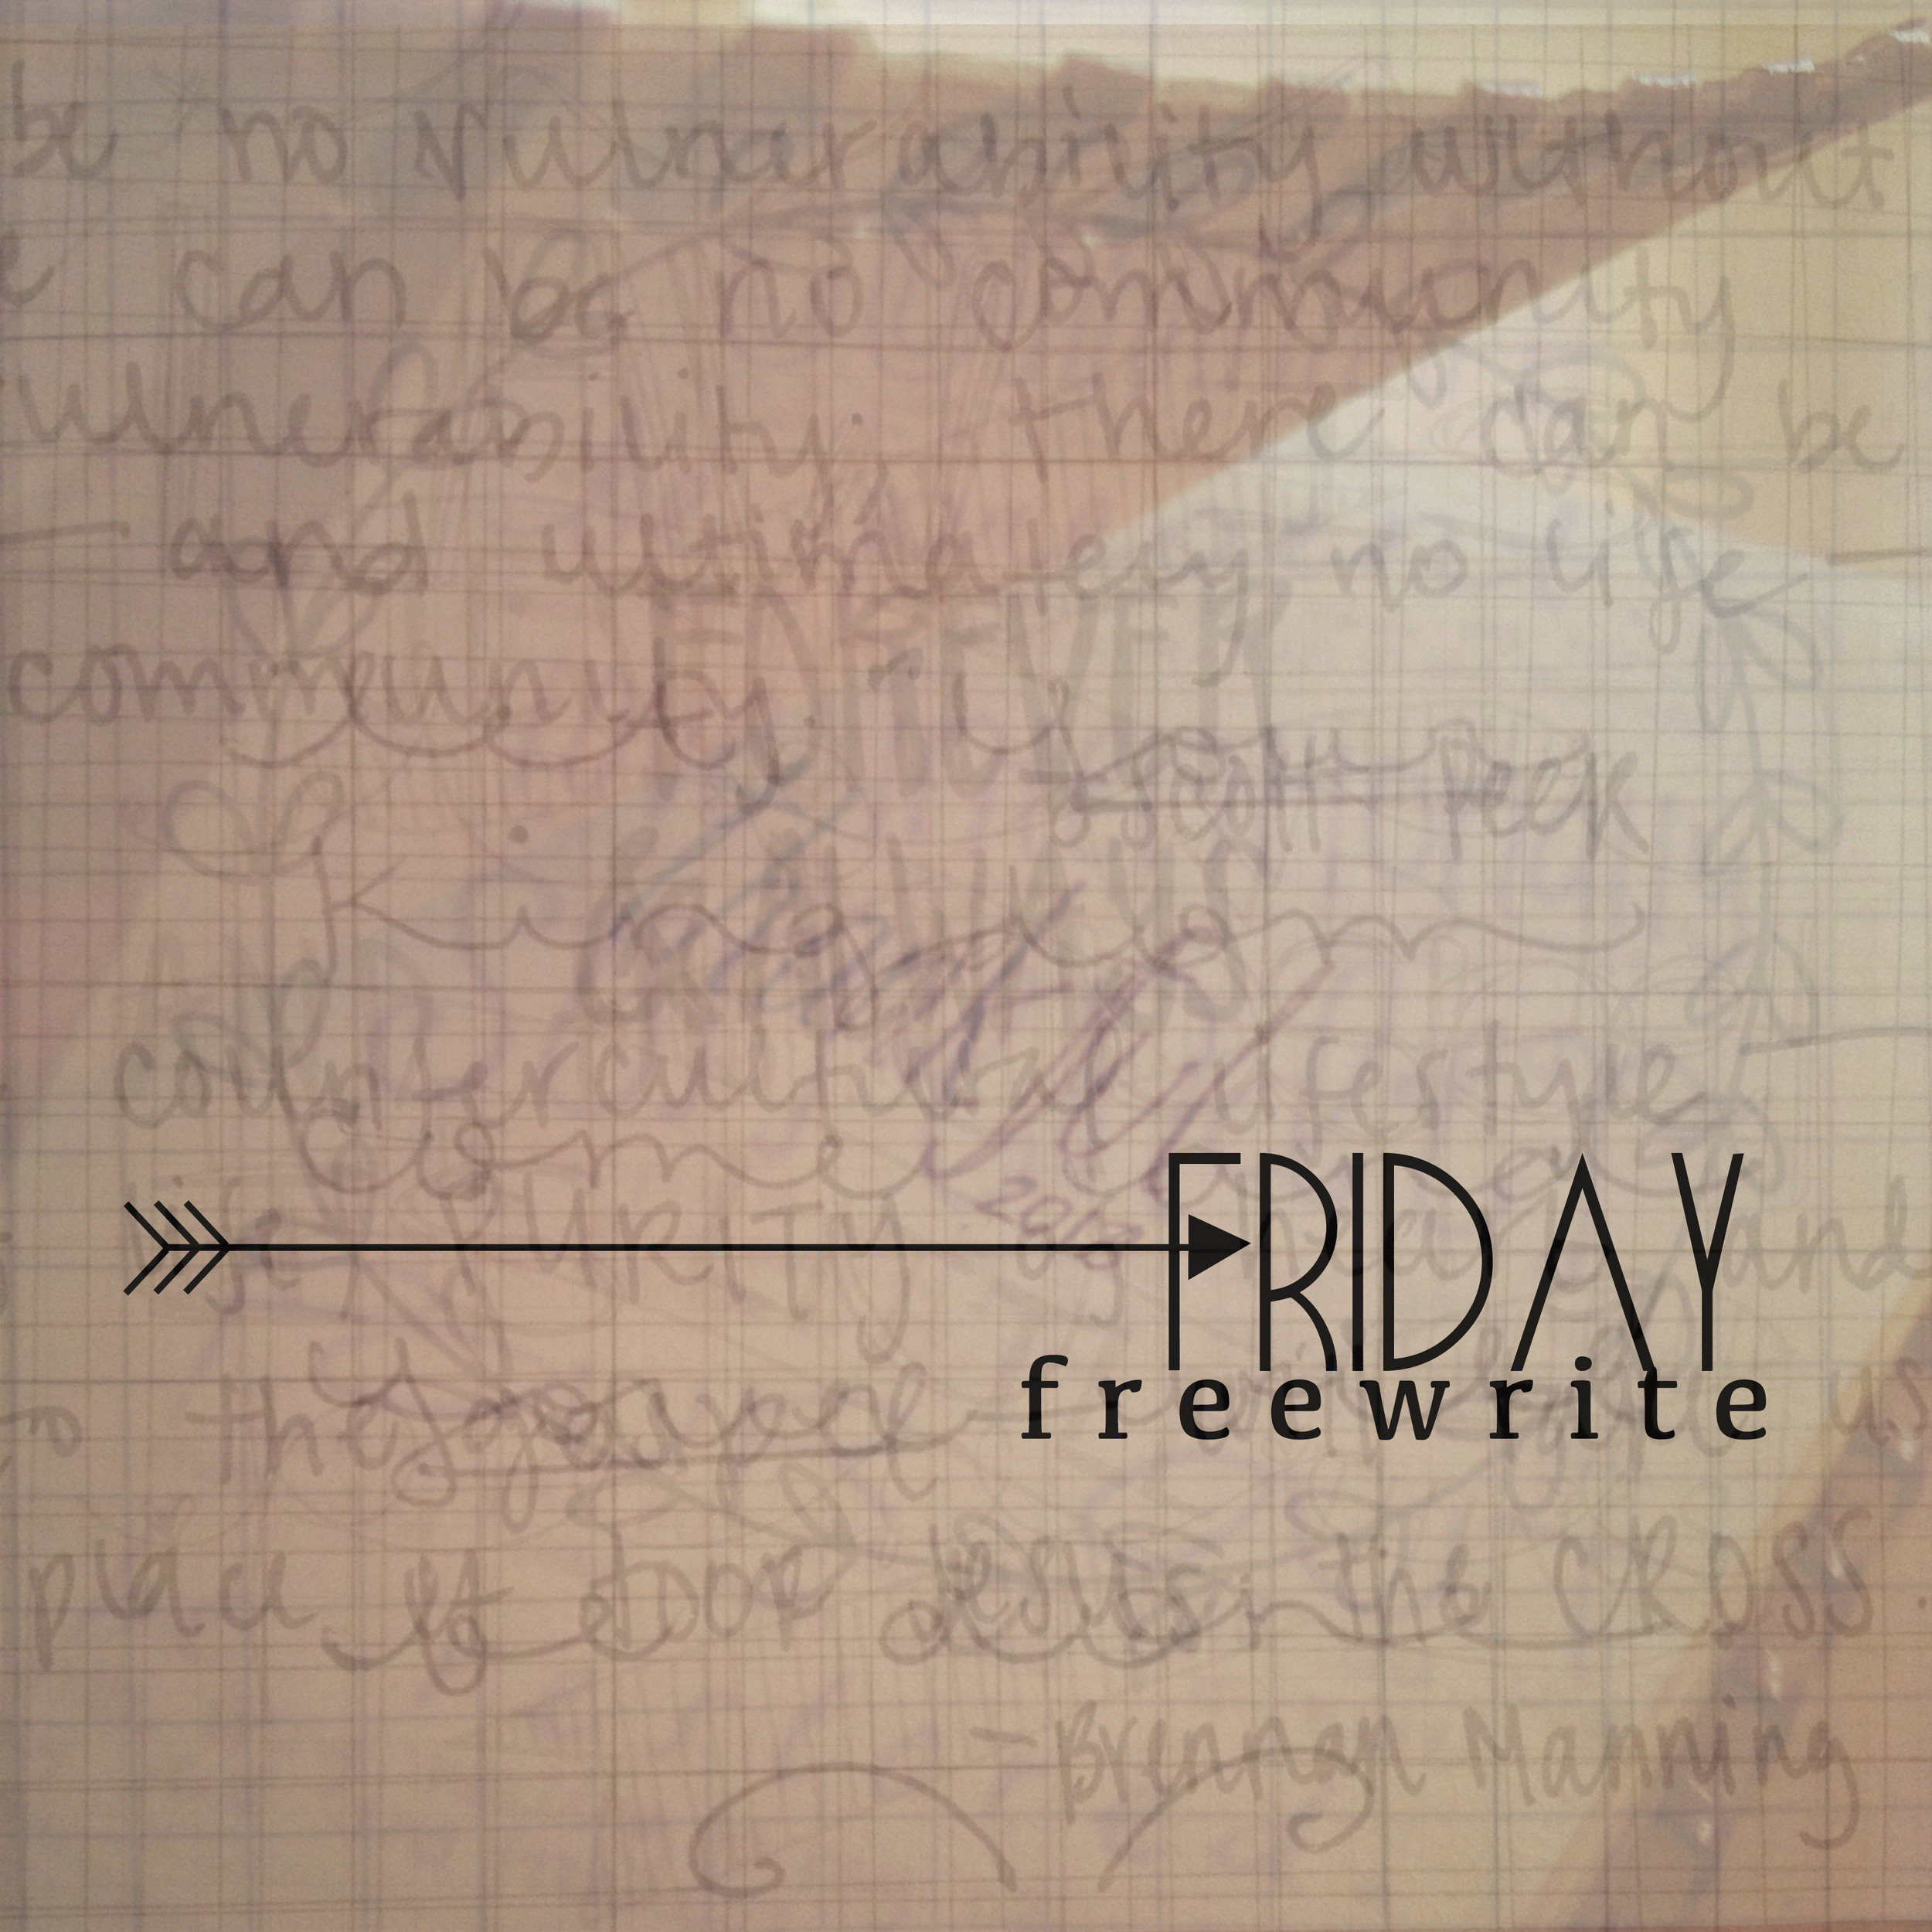 FRIDAYfreewrite.jpg